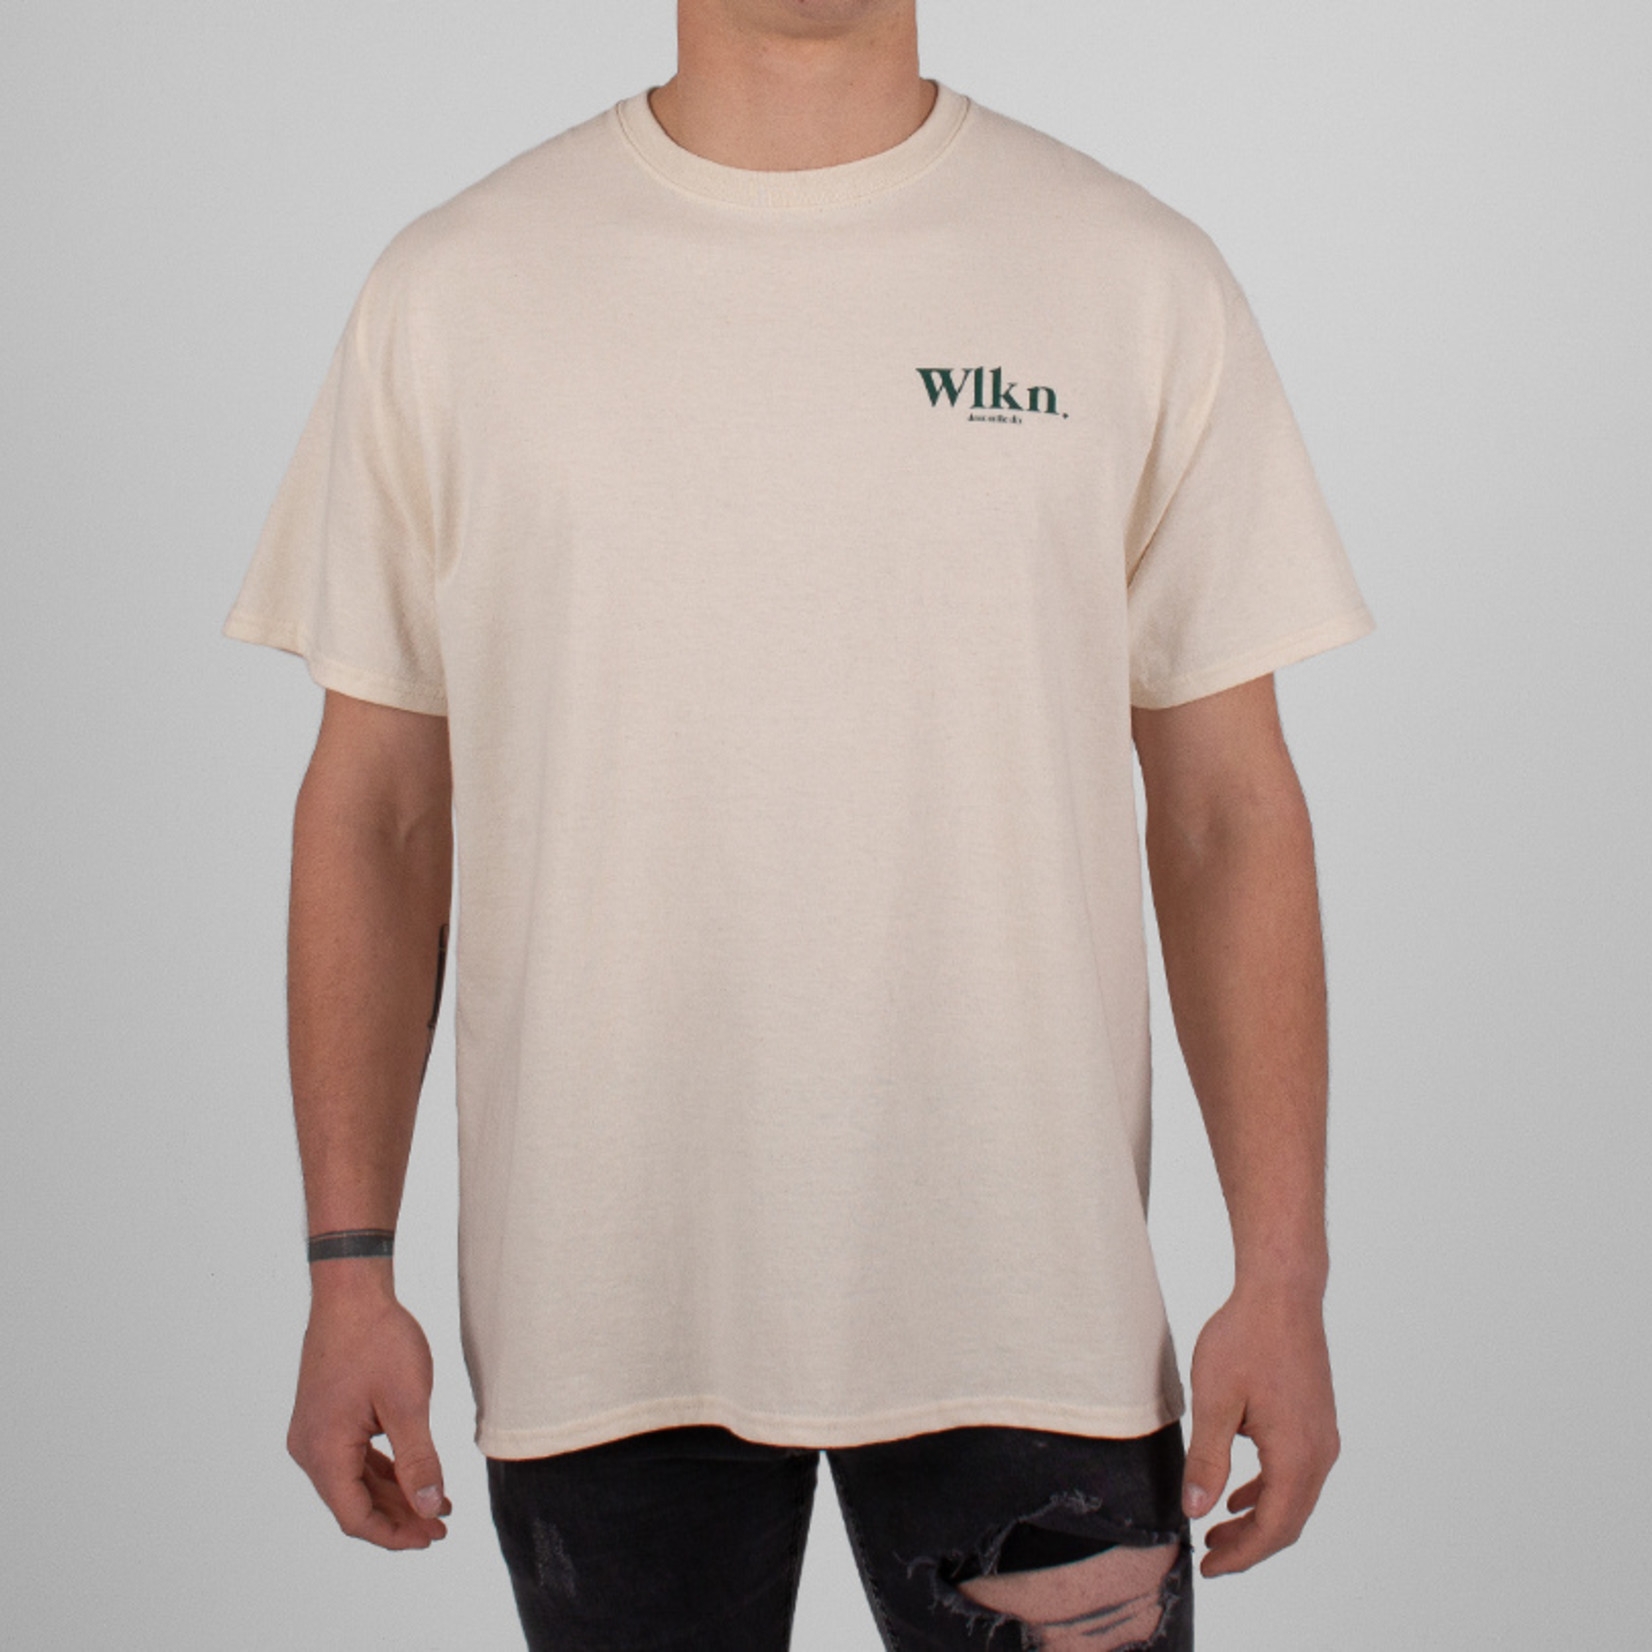 WLKN WLKN : Vintage T-Shirt